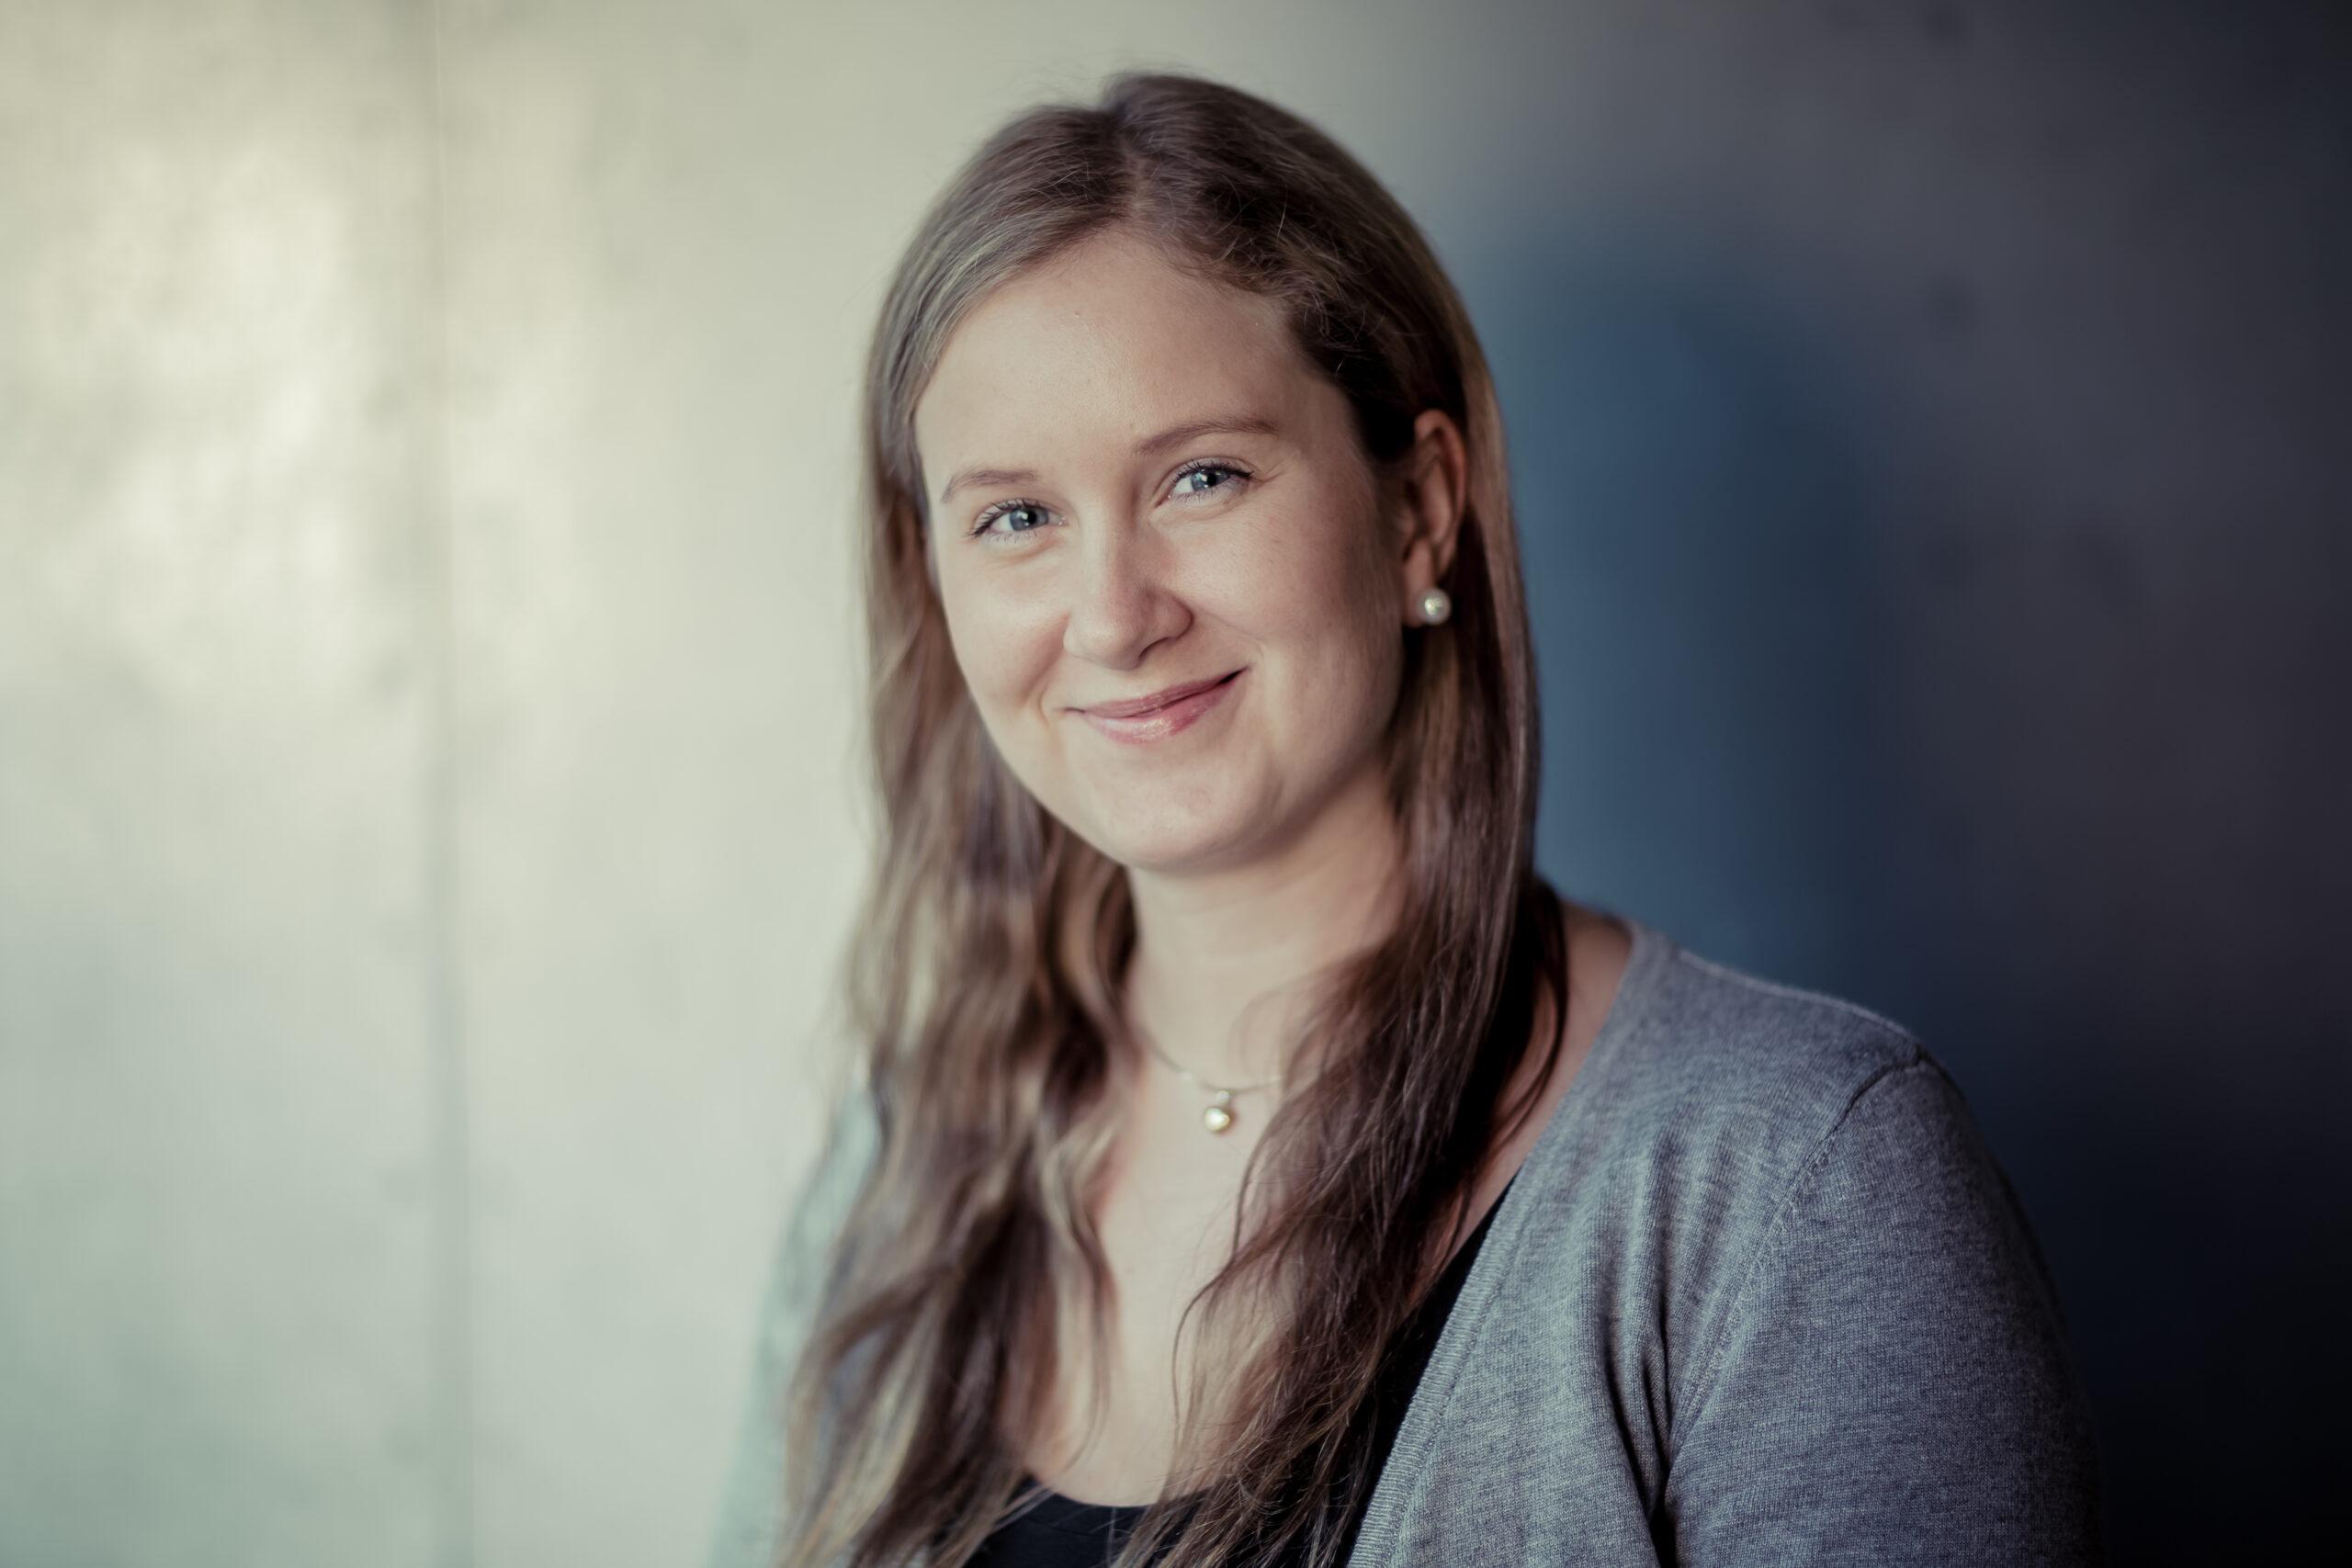 Mie Petersen